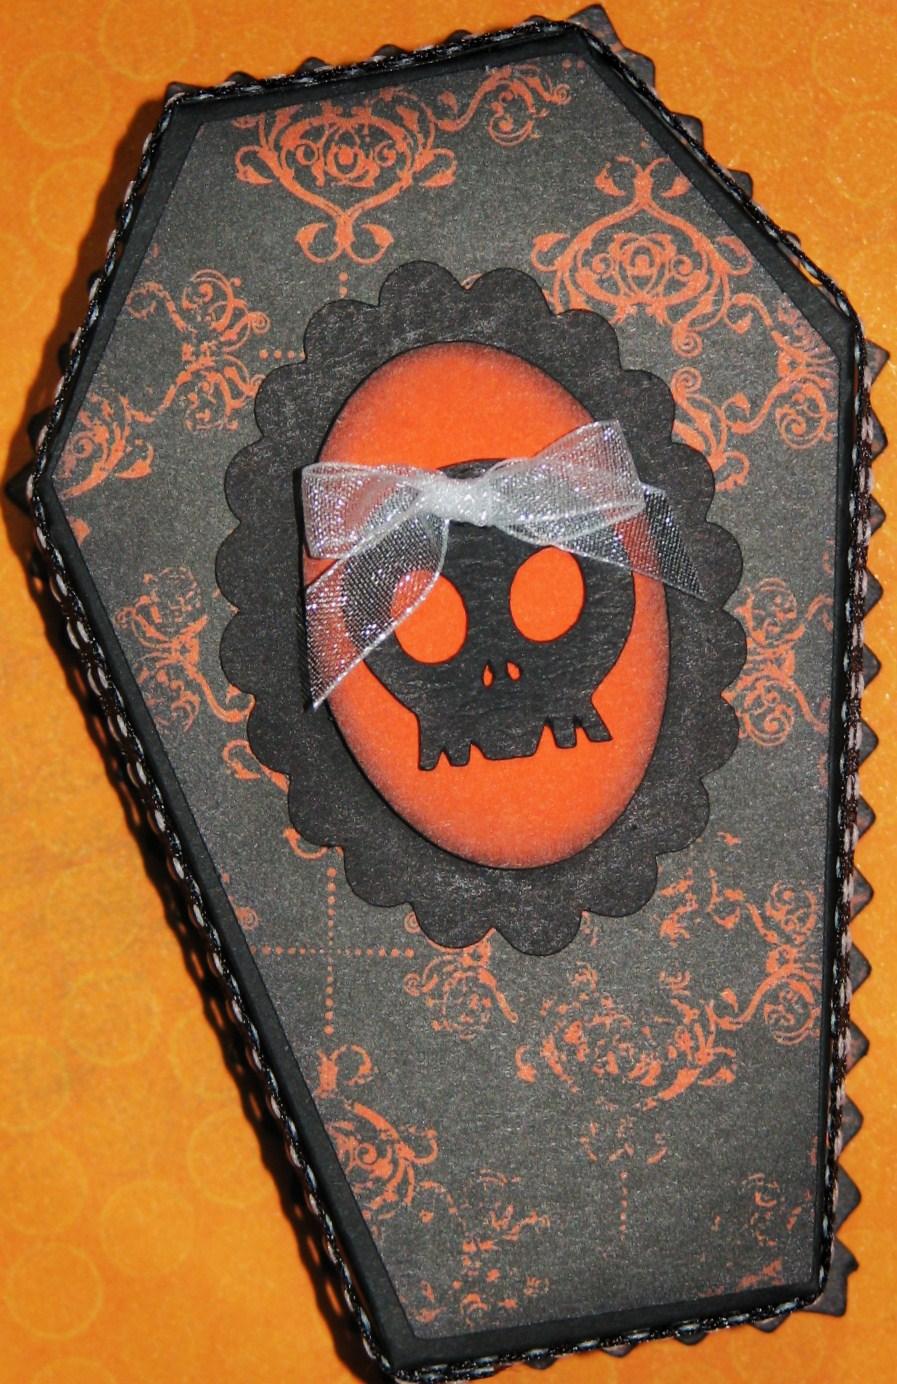 The Avid Scrapper Halloween Coffin Treat Boxes